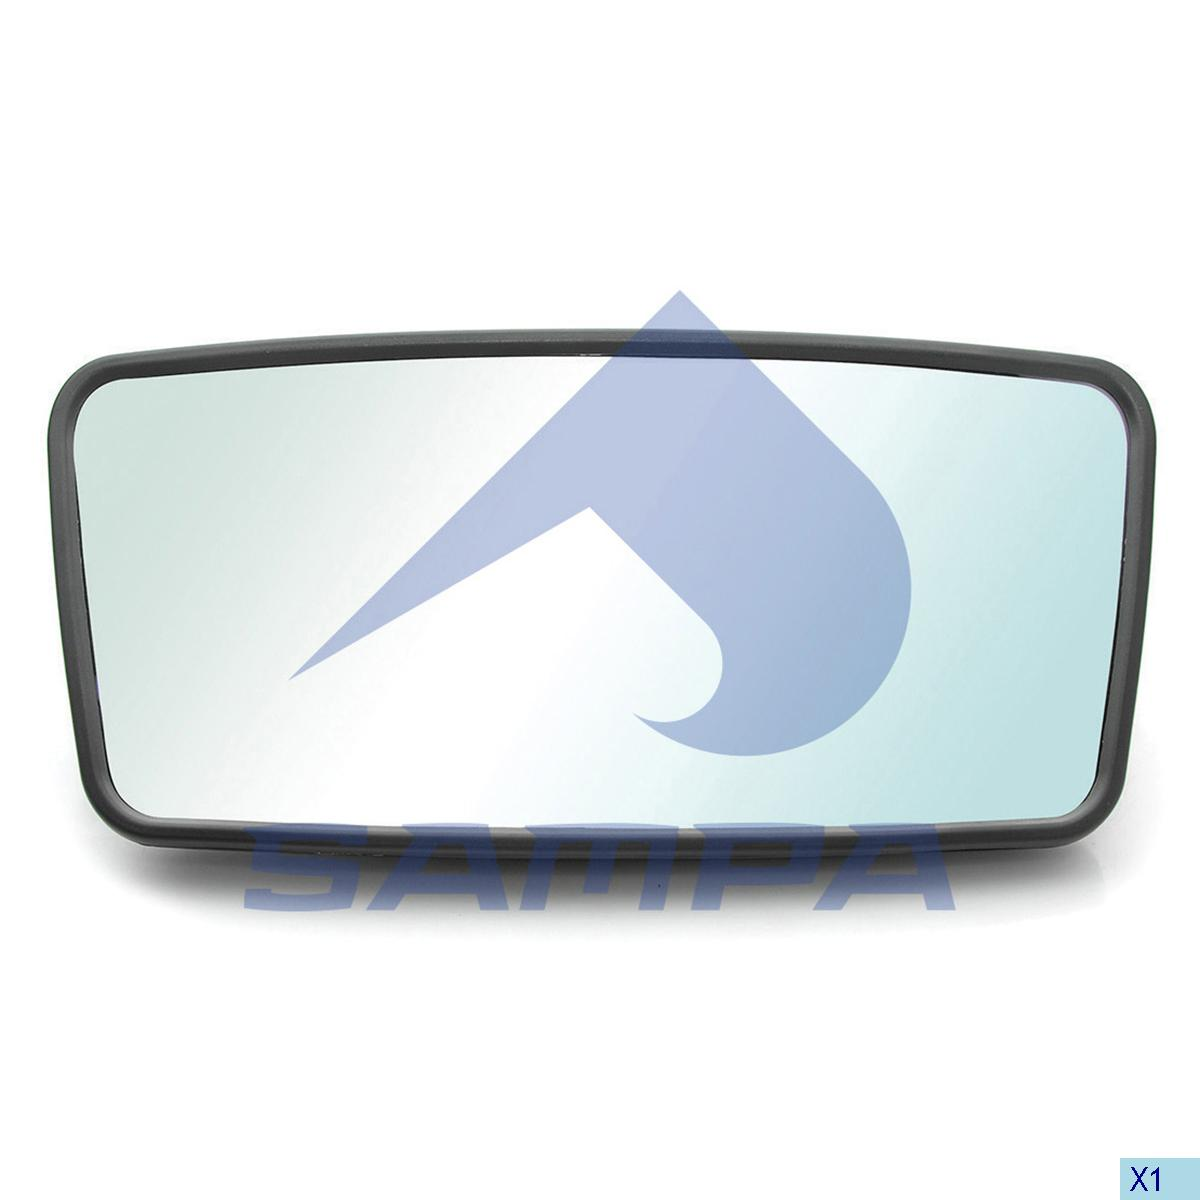 Mirror, Man, Cab